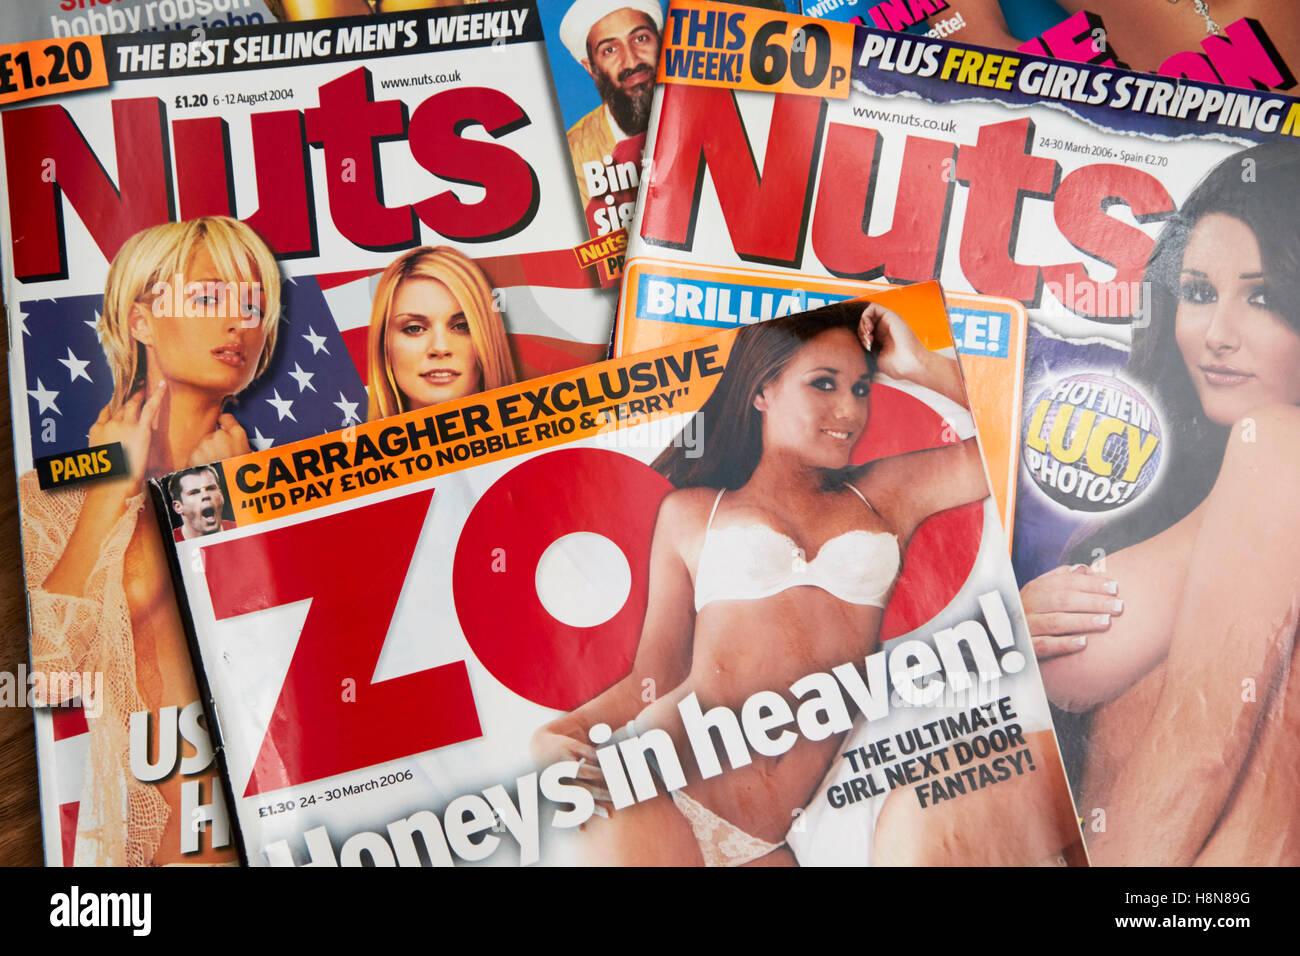 nude (16 photos), Cleavage Celebrites pictures